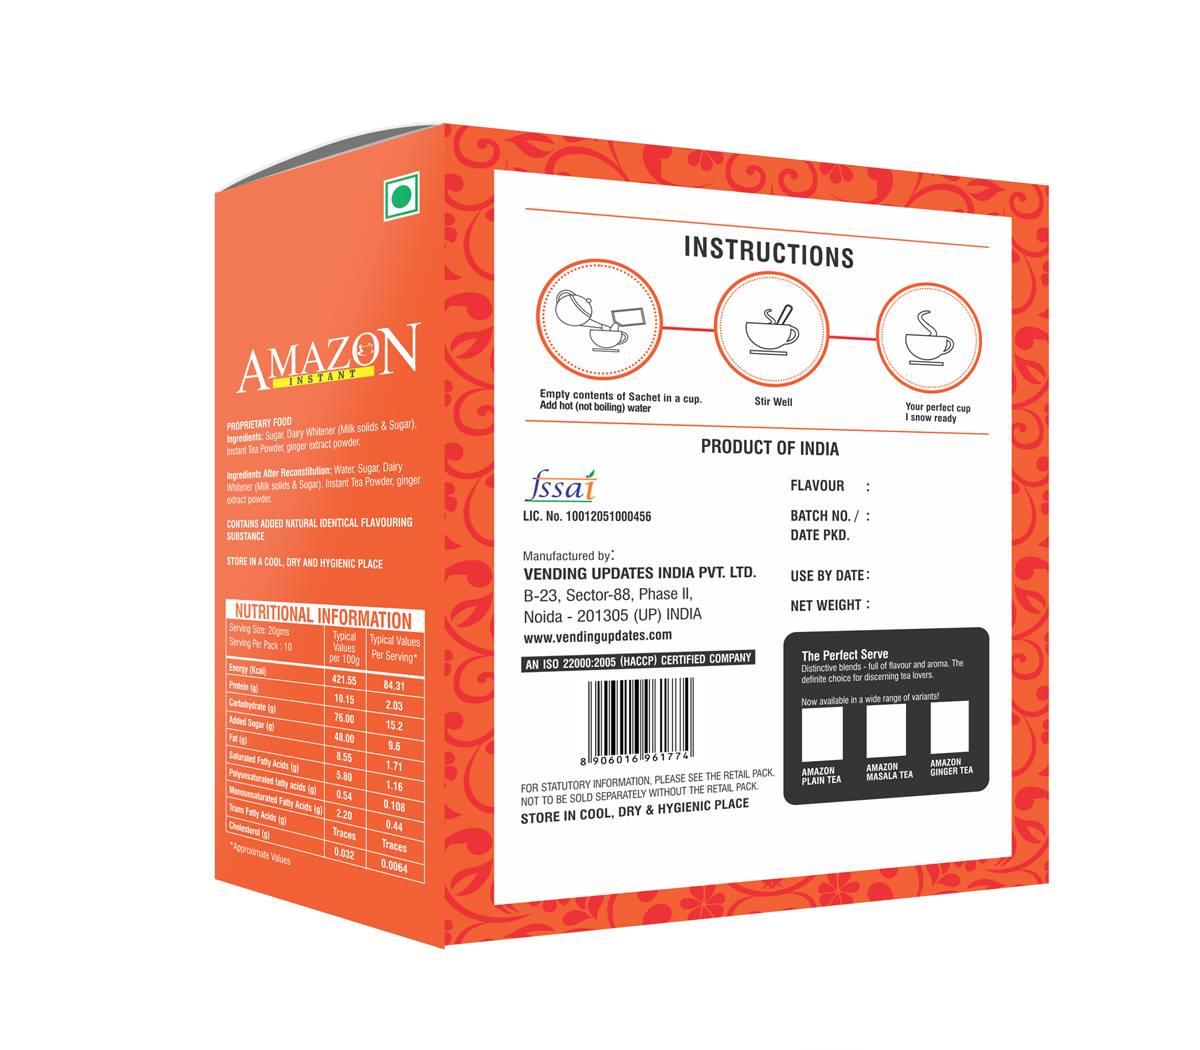 amazon_instant_tea_premix_back_ginger